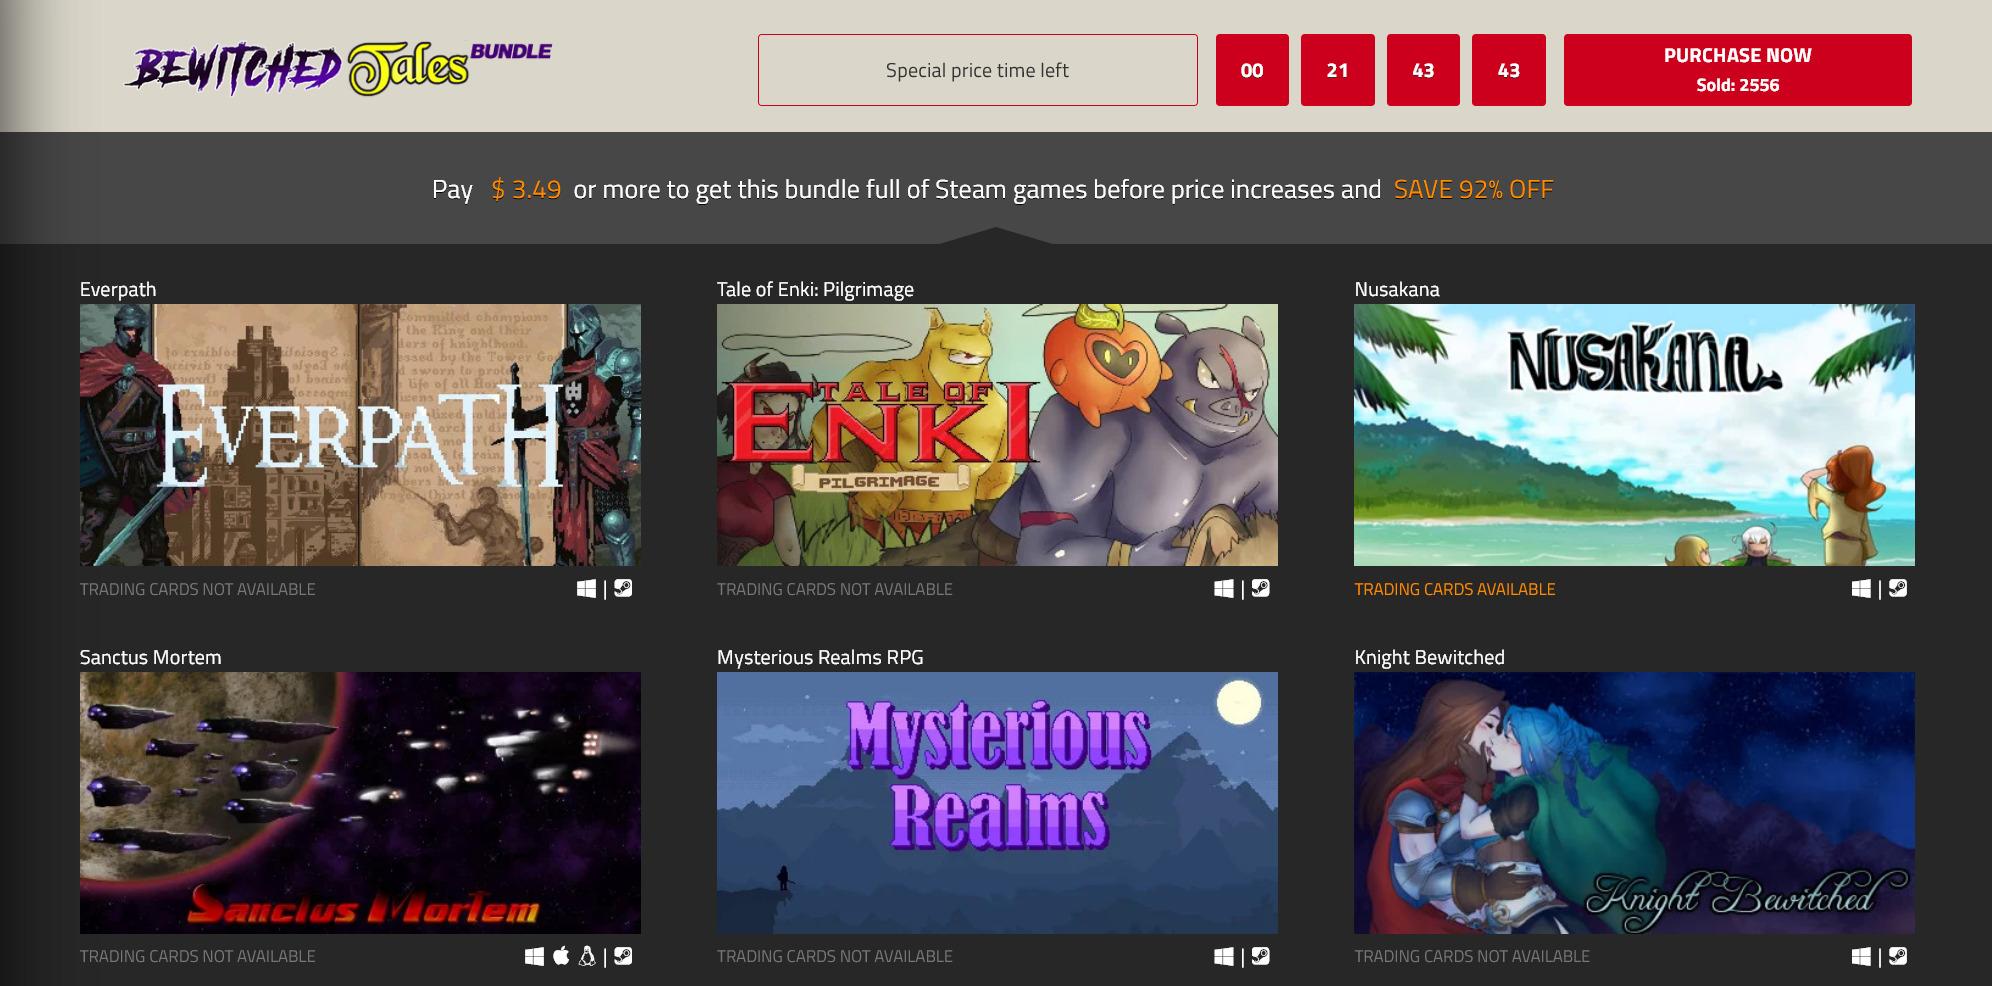 Screenshot_2020-03-10 Bewitched Tales Bundle 6 Steam Games 92% OFF.jpg